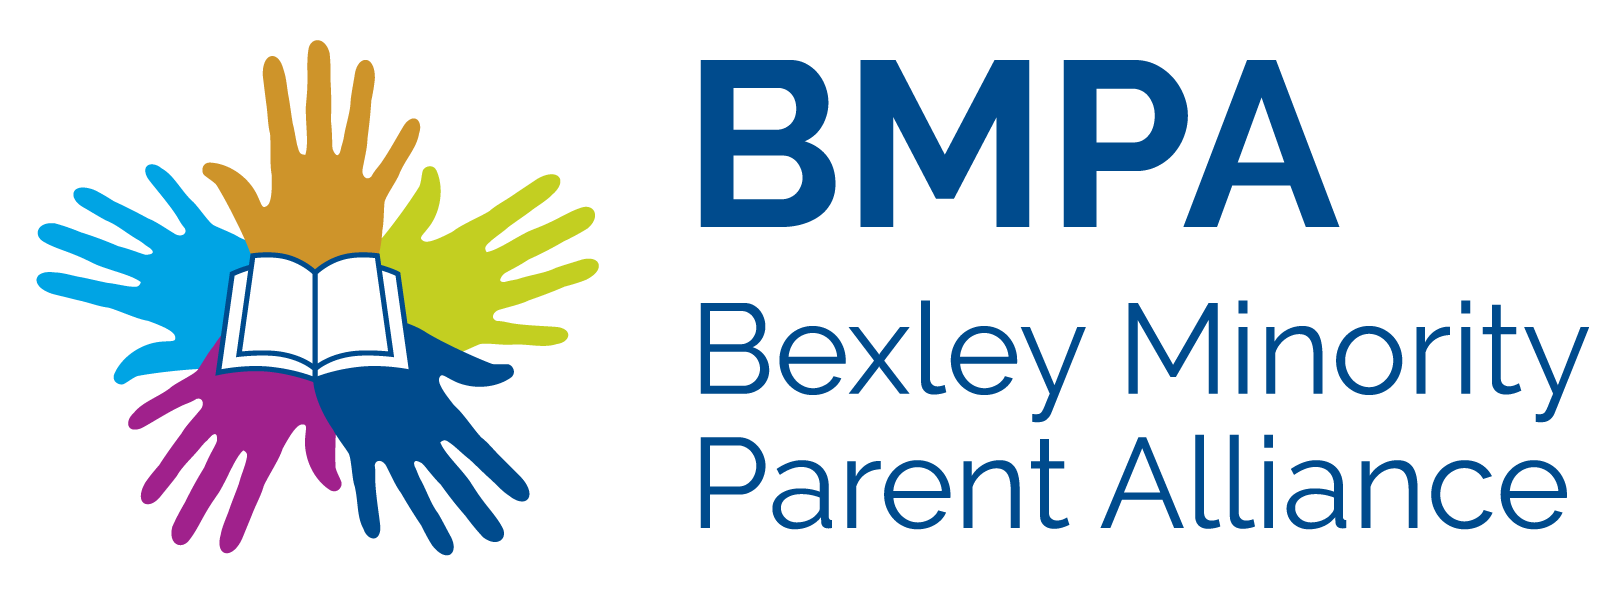 Bexley Minority Parent Alliance Logo